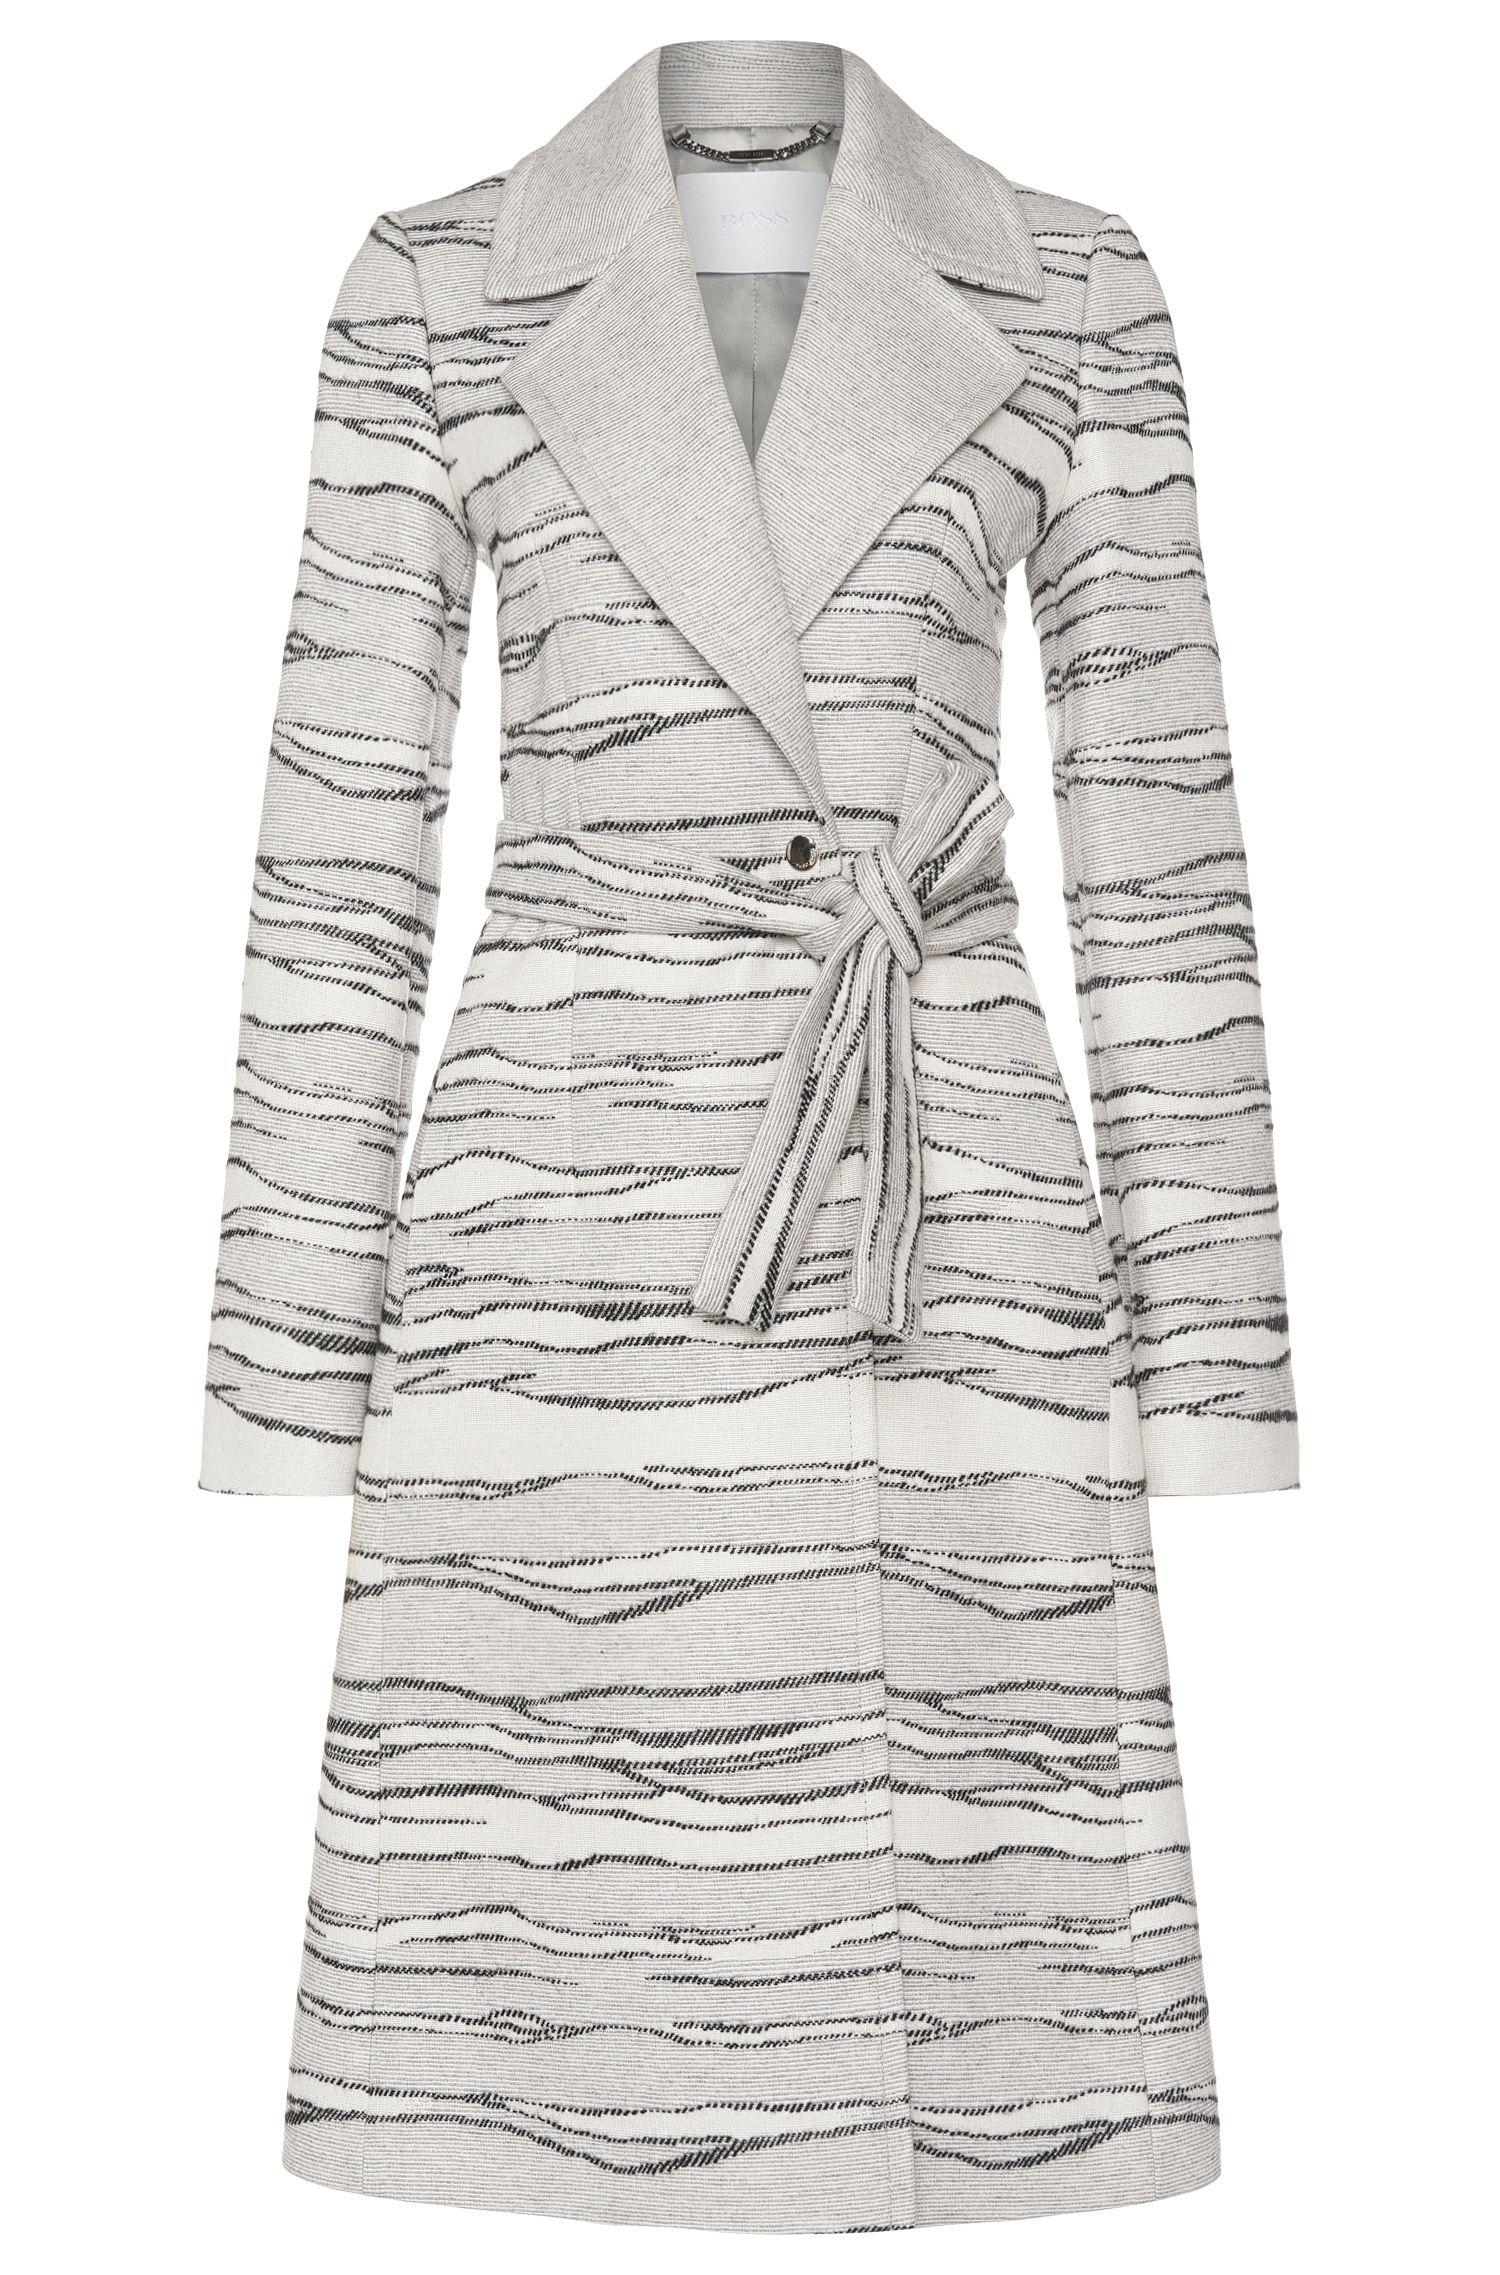 'Catyla' | Wool Silk A-Line Jacquard Coat